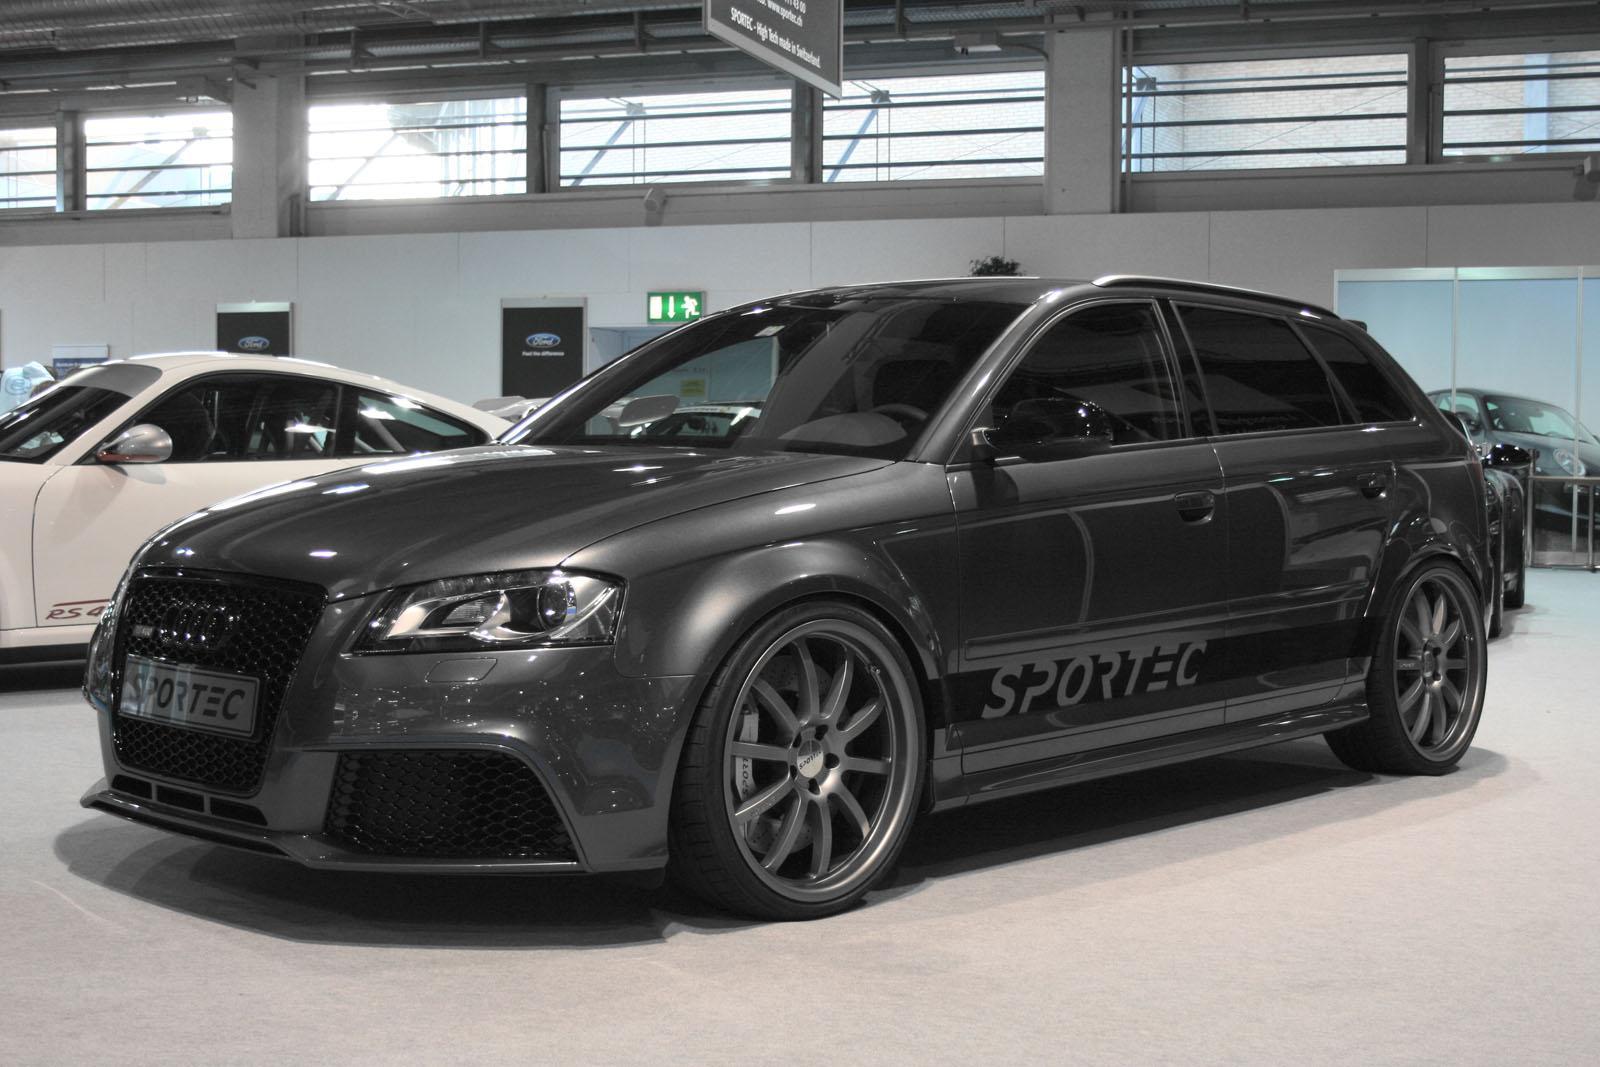 Sportec Audi Rs 3